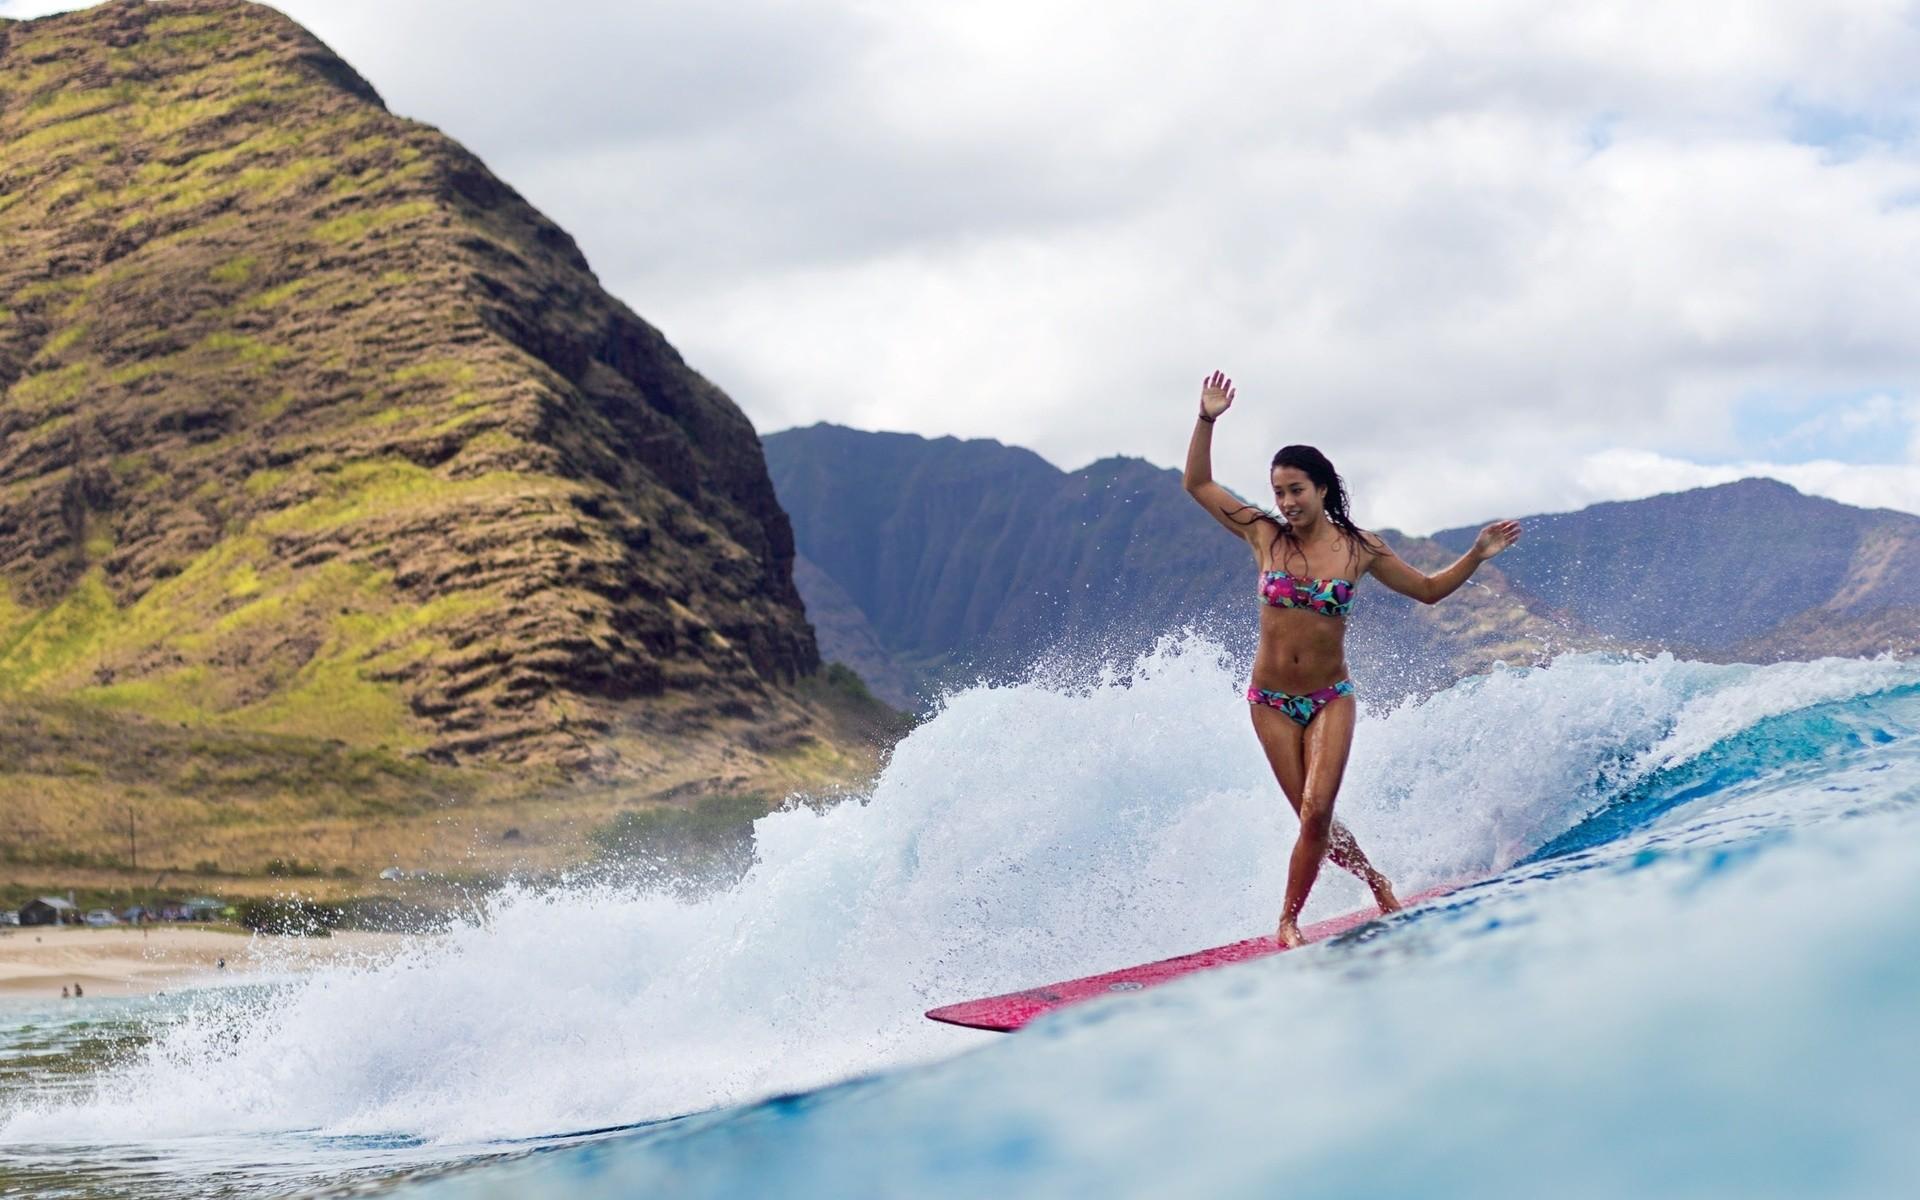 Res: 1920x1200, ocean girl surfing mountain waves sea girls women wallpaper